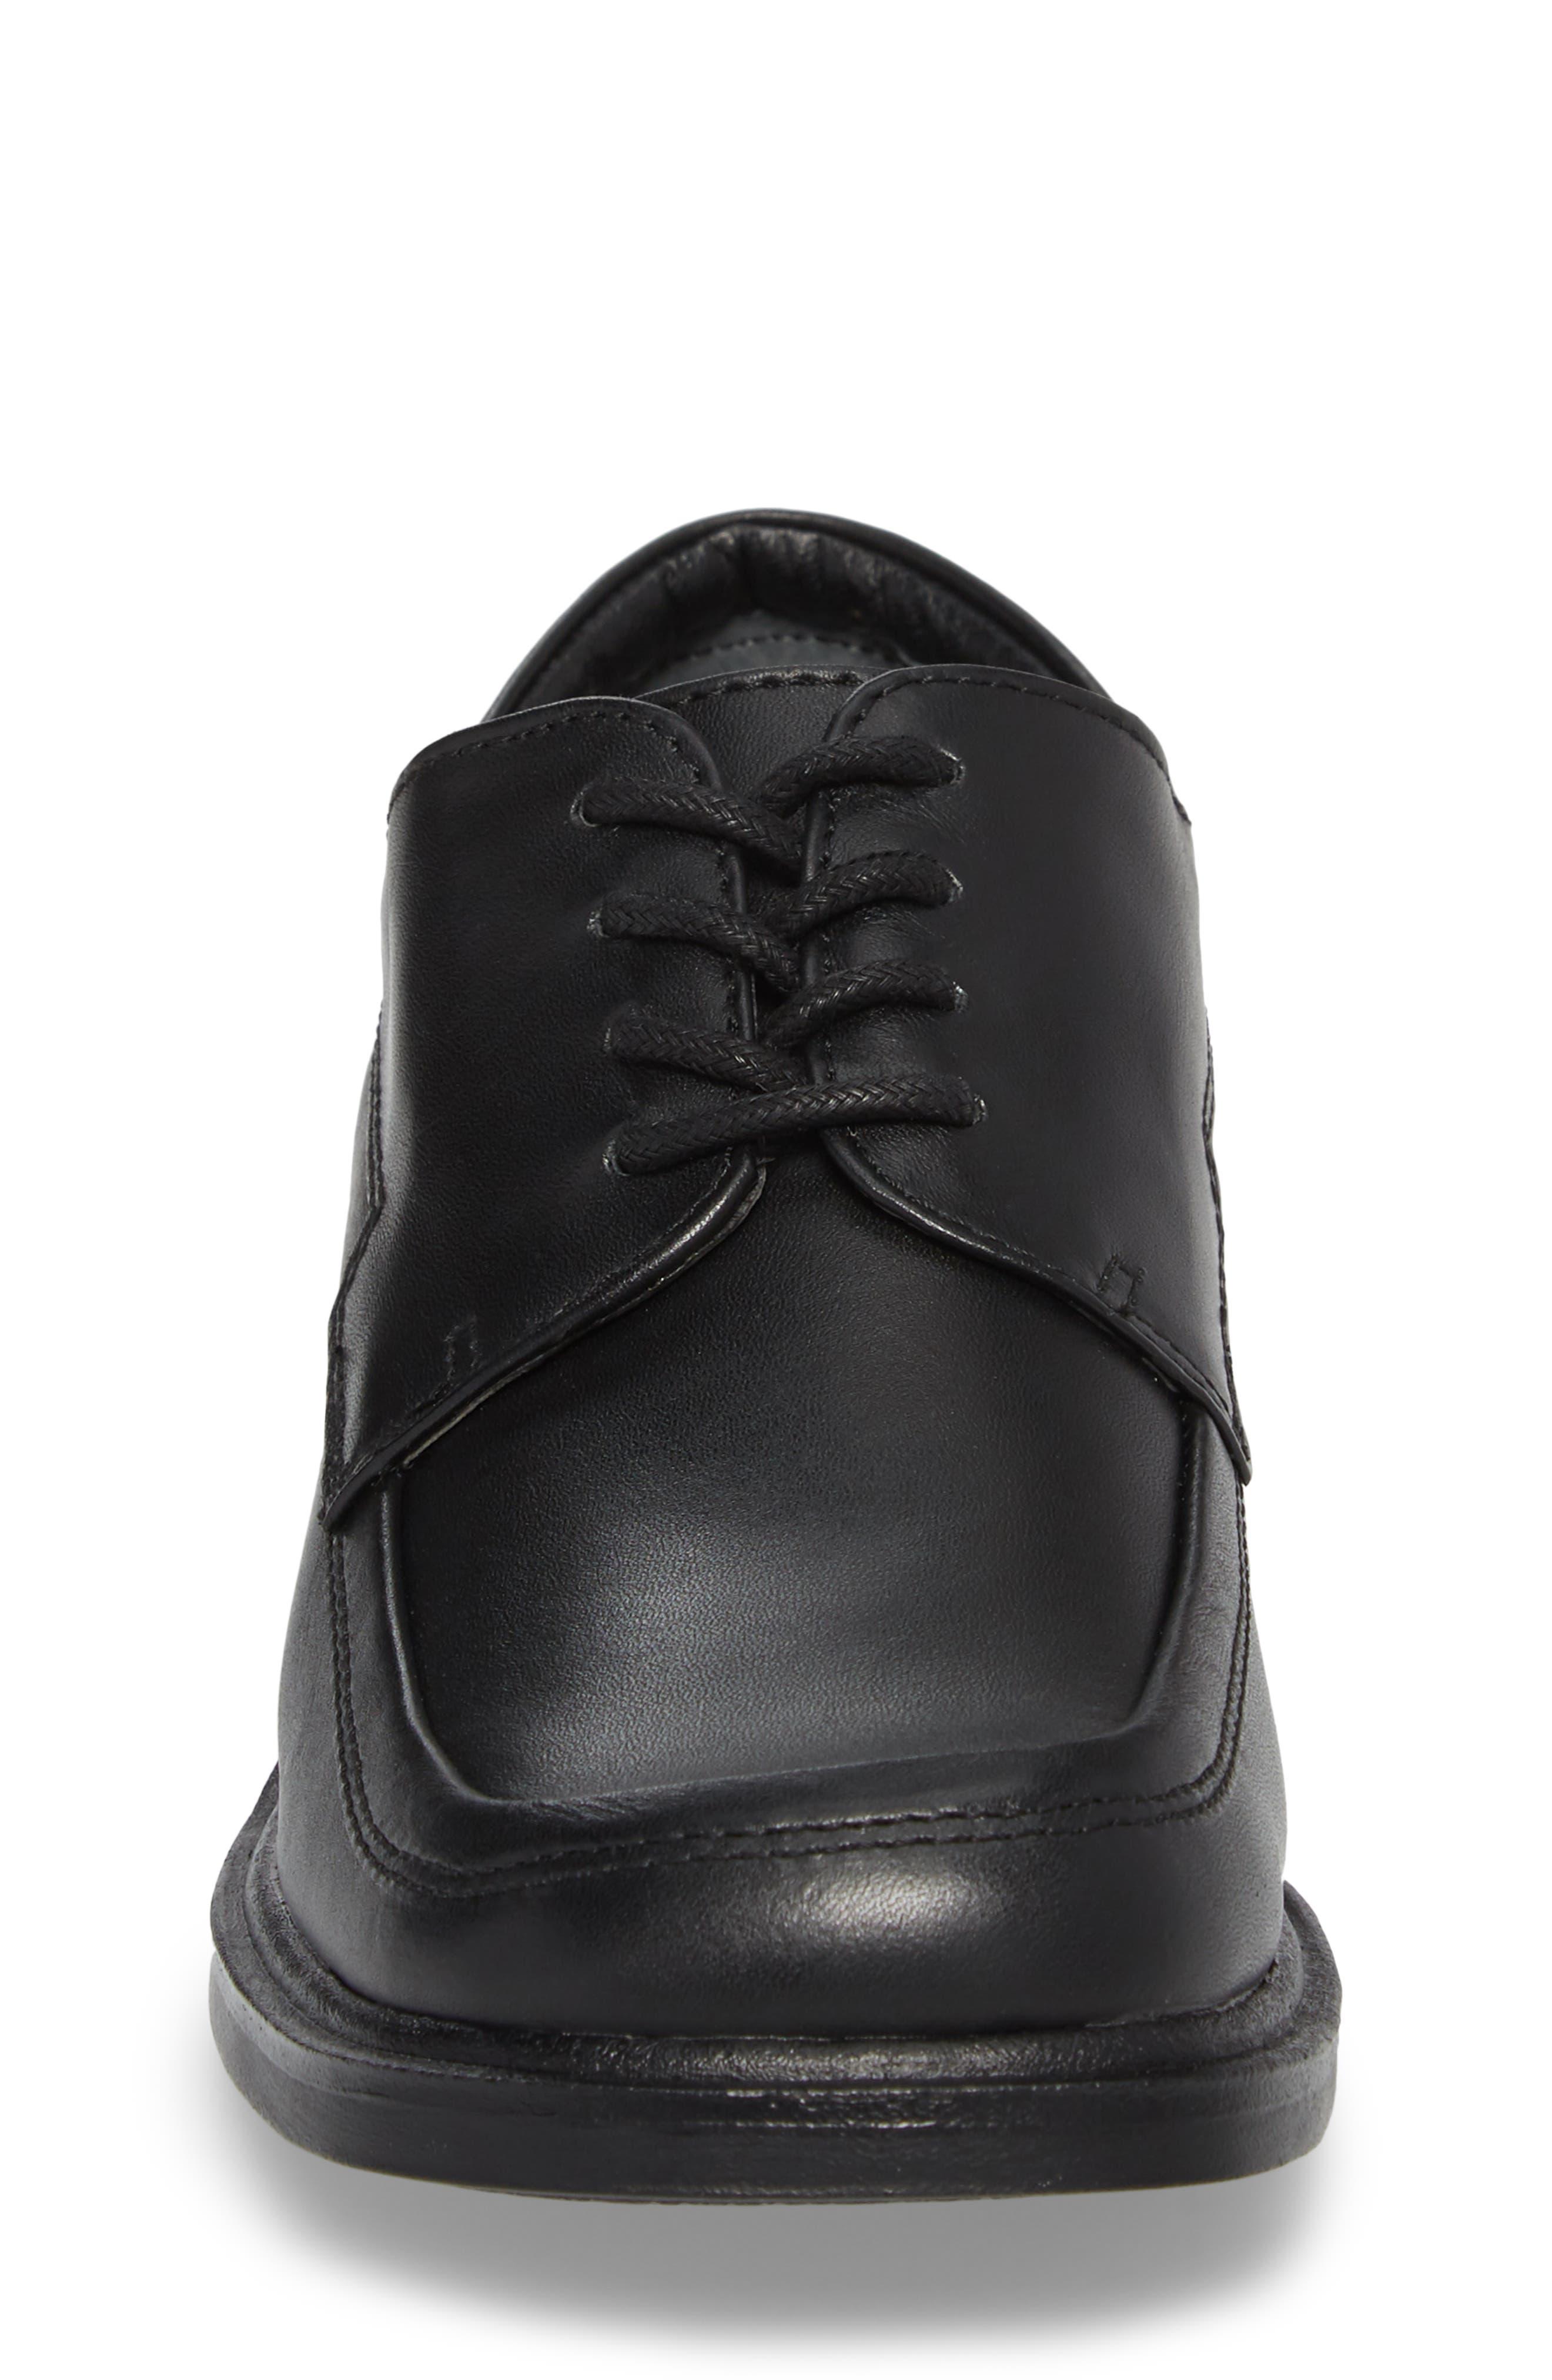 Reaction Kenneth Cole 'T-Flex Senior' Oxford,                             Alternate thumbnail 4, color,                             Black/ Black Leather